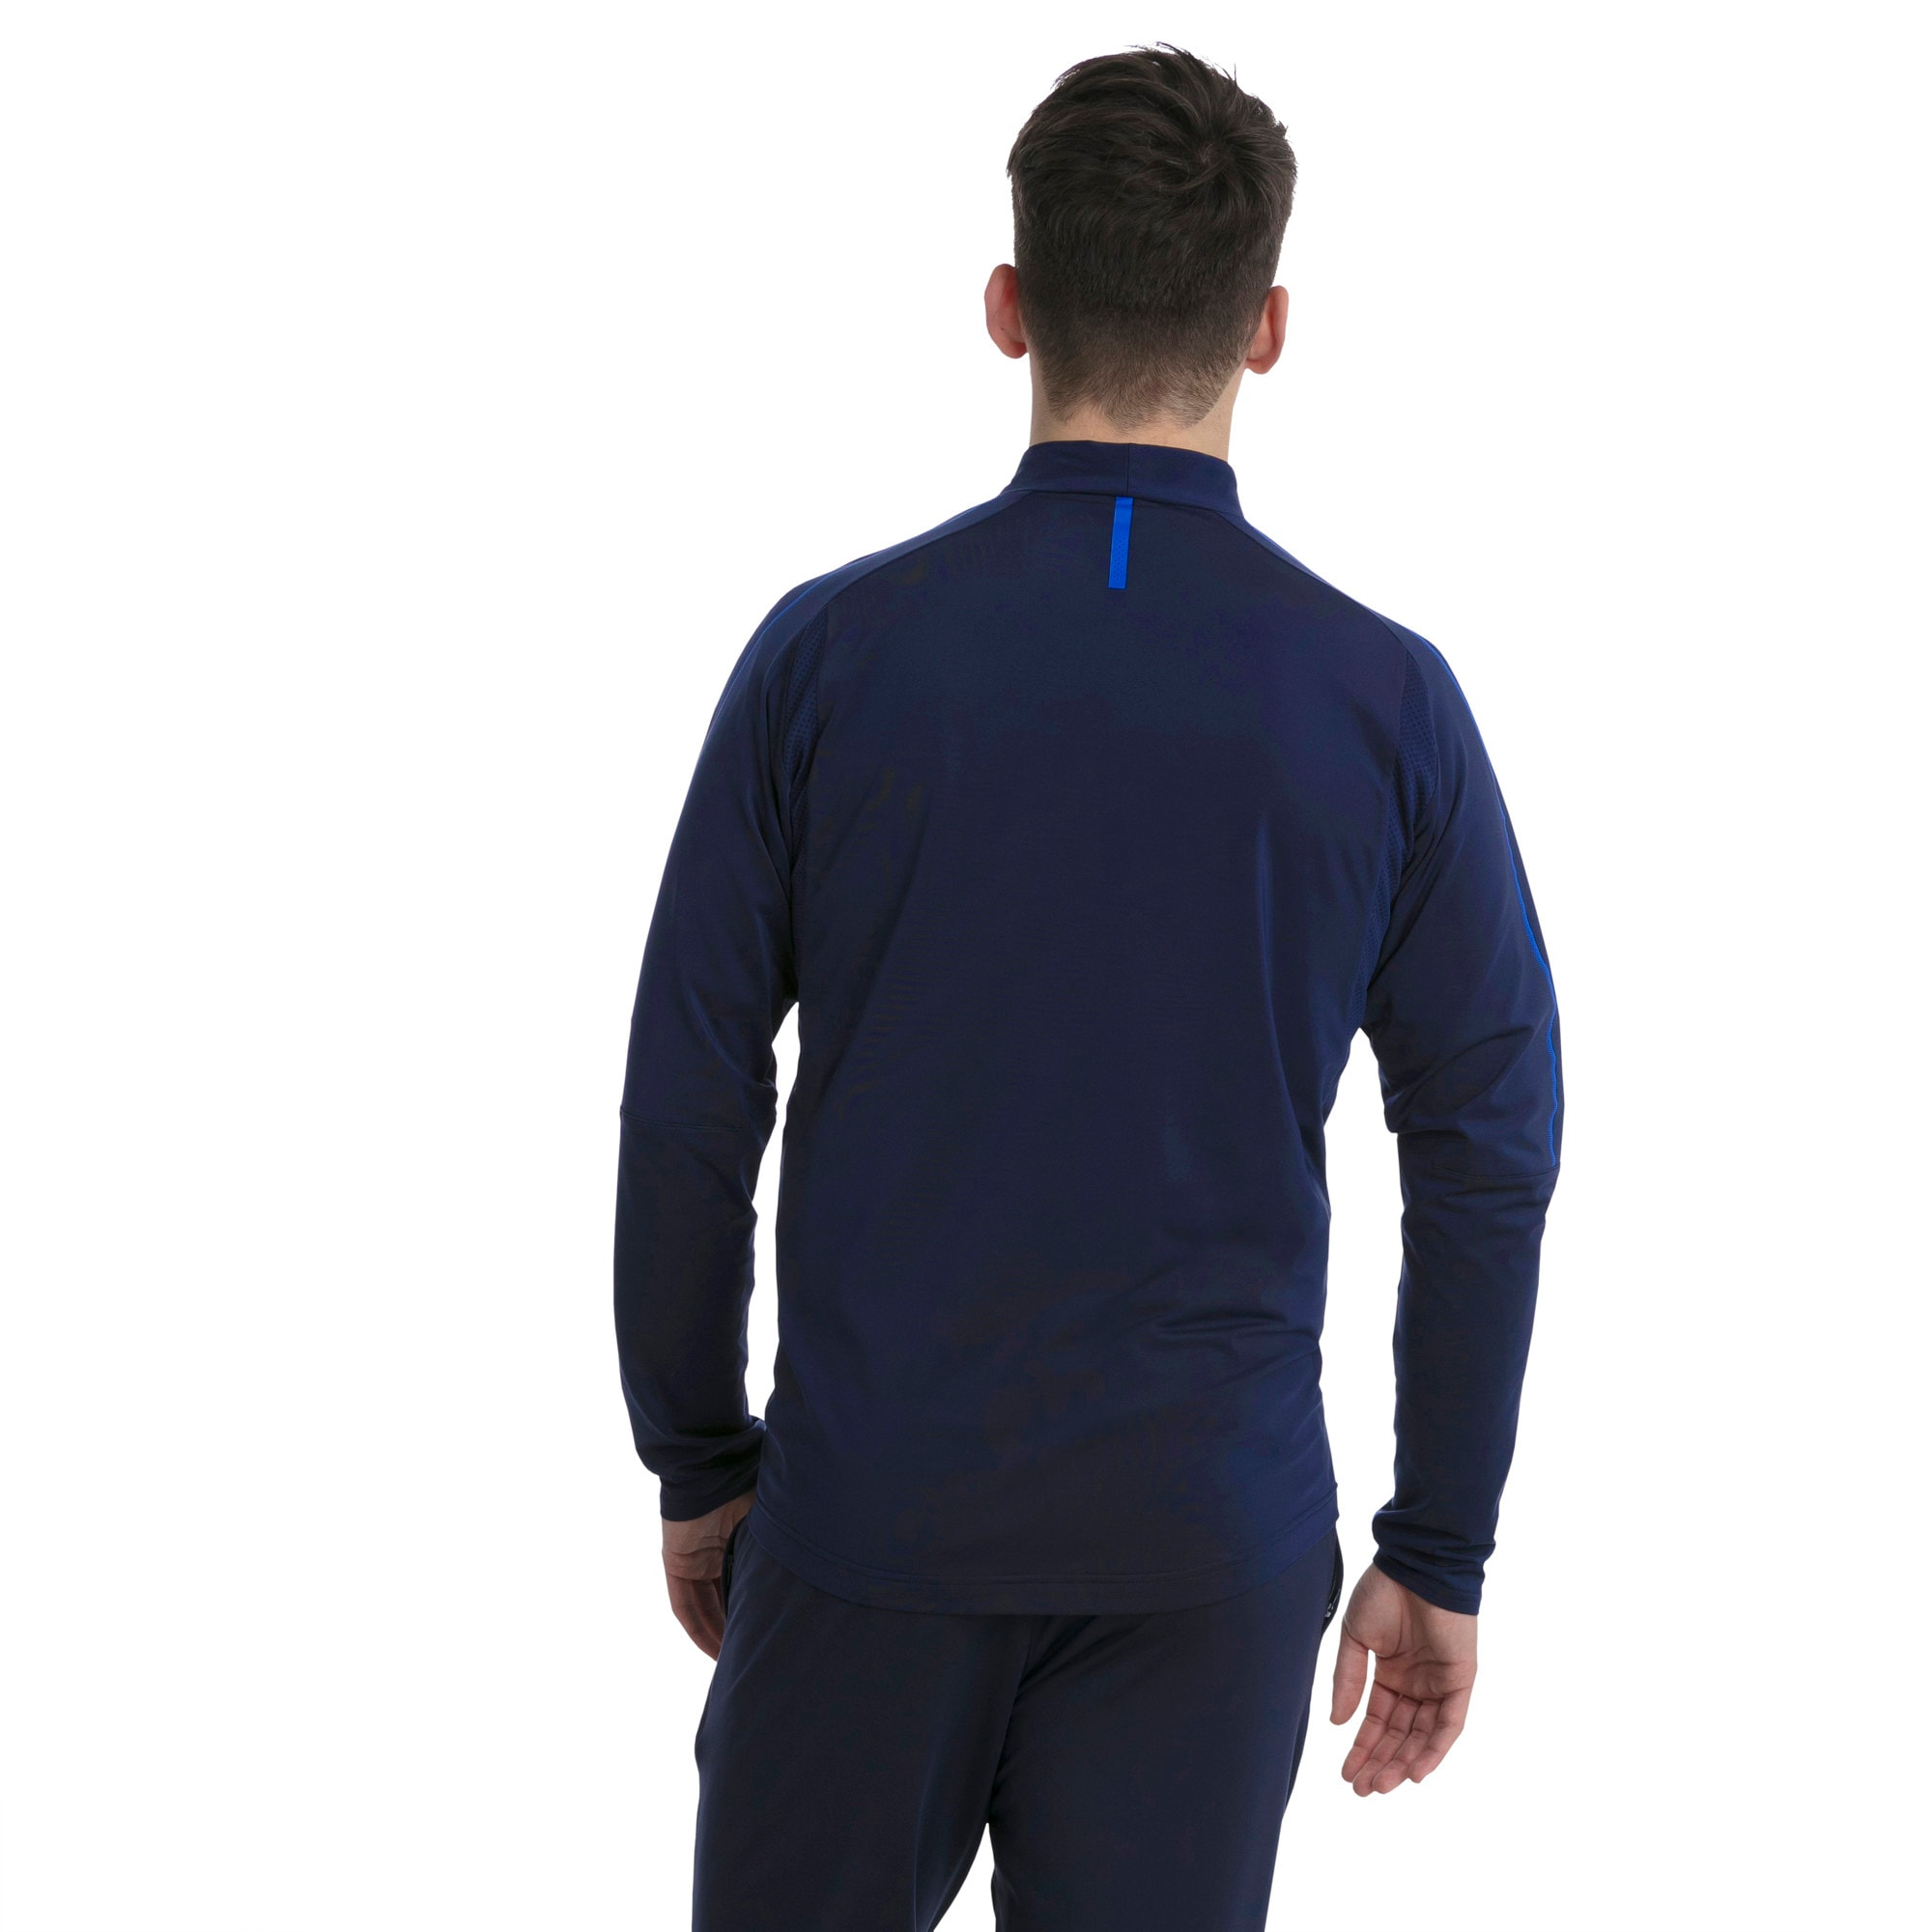 Thumbnail 3 of Italia 1/4 Zip Training Top, Peacoat-Team Power Blue, medium